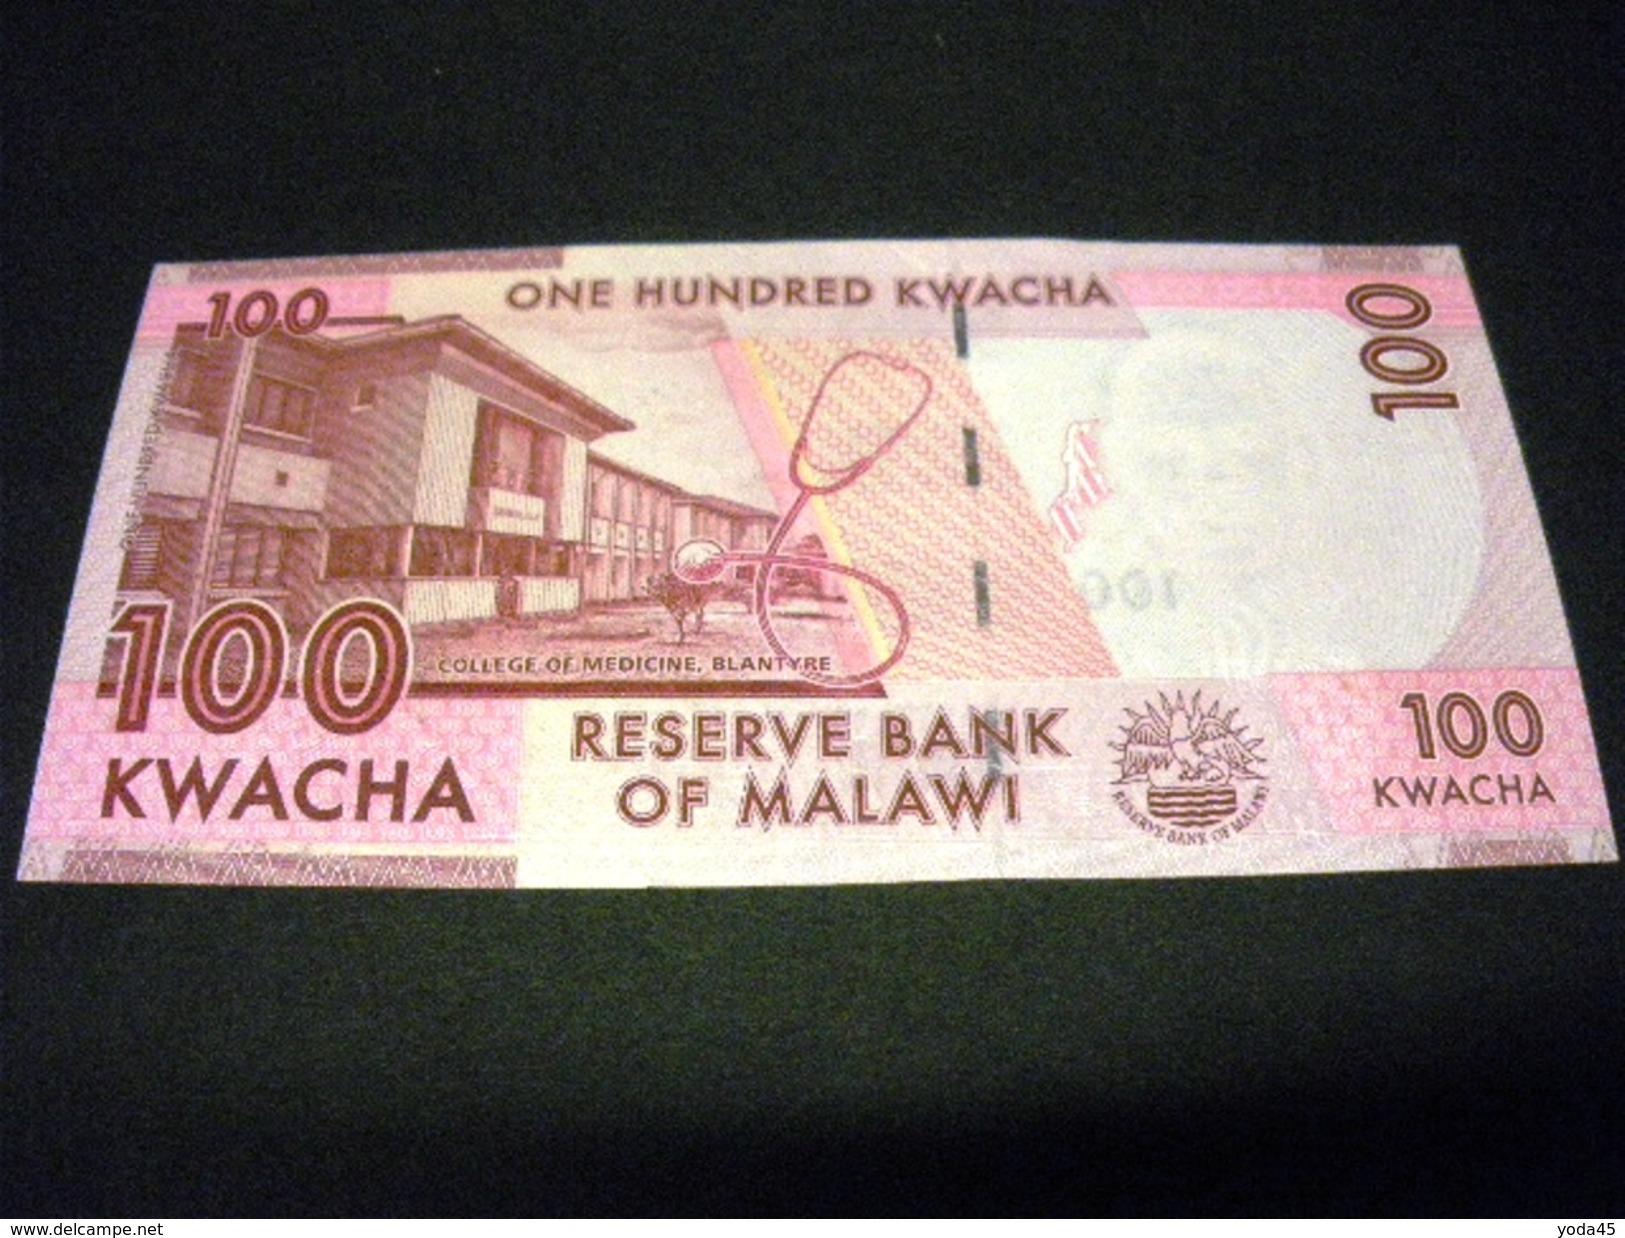 MALAWI 100 Kwacha 01/01/2012 , Pick N° 59 A , MALAWI - Malawi